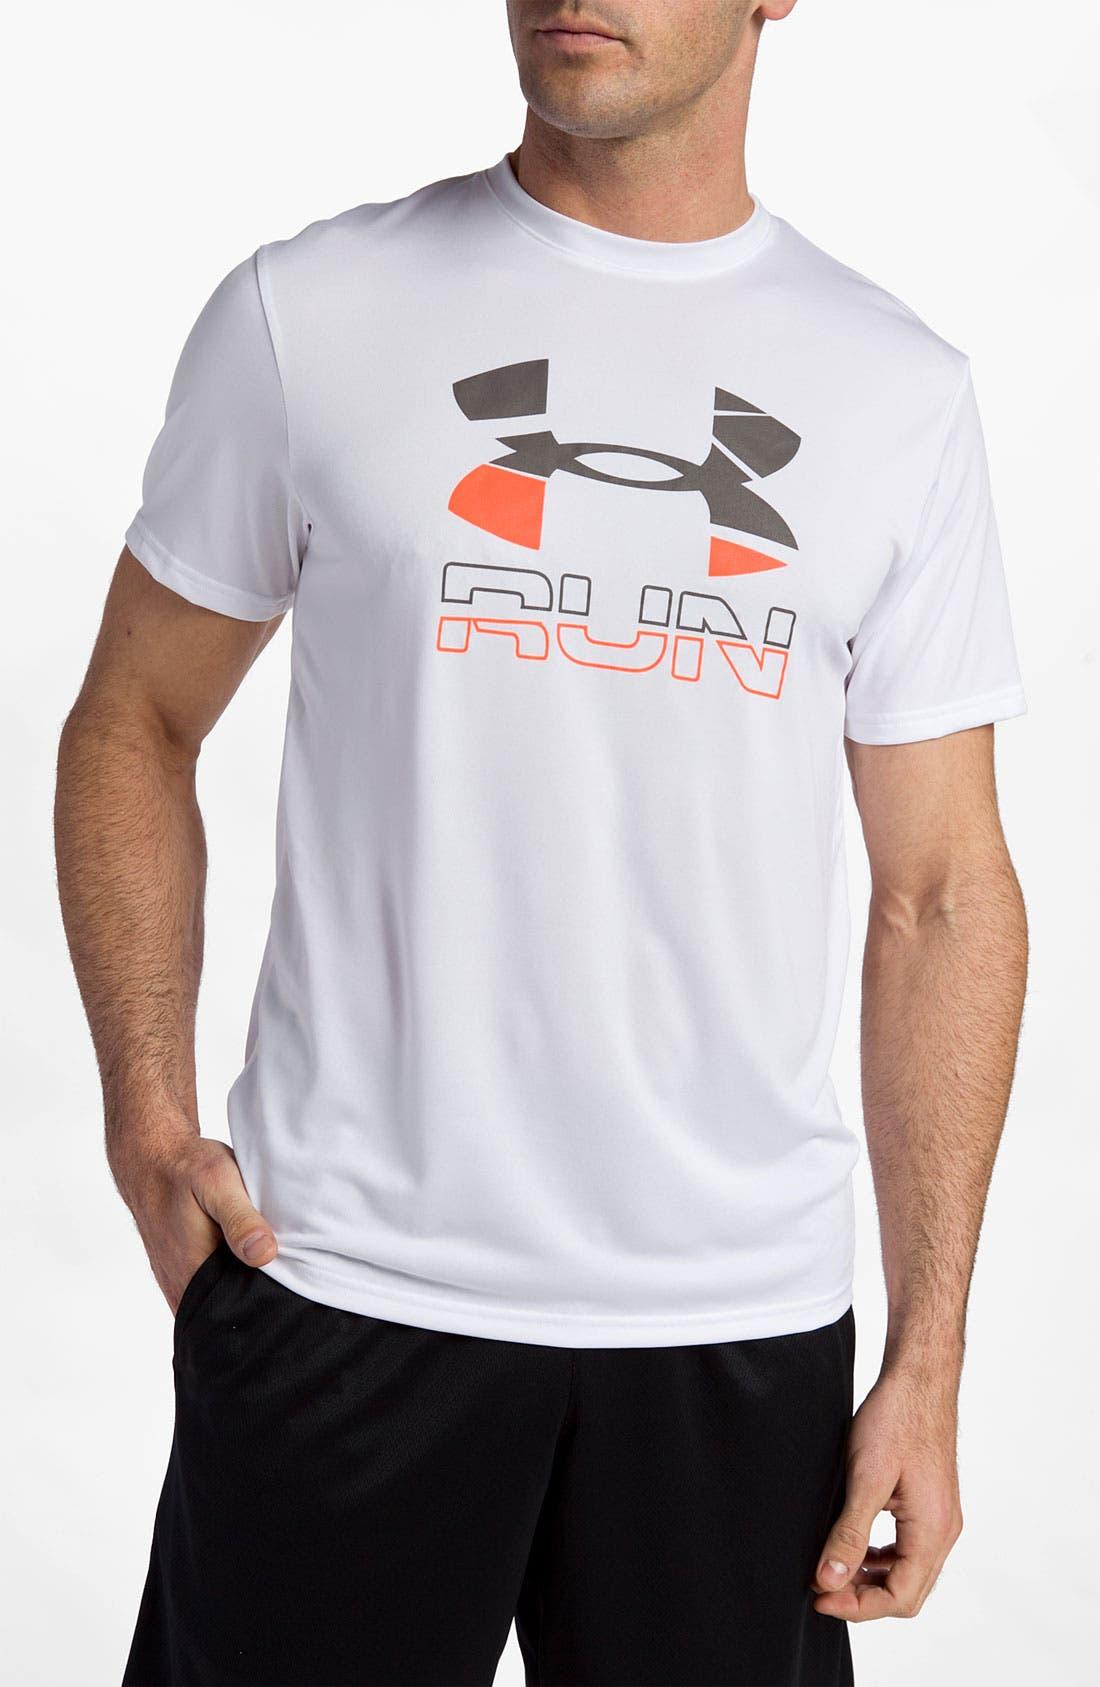 Main Image - Under Armour 'Run Graphic' T-Shirt